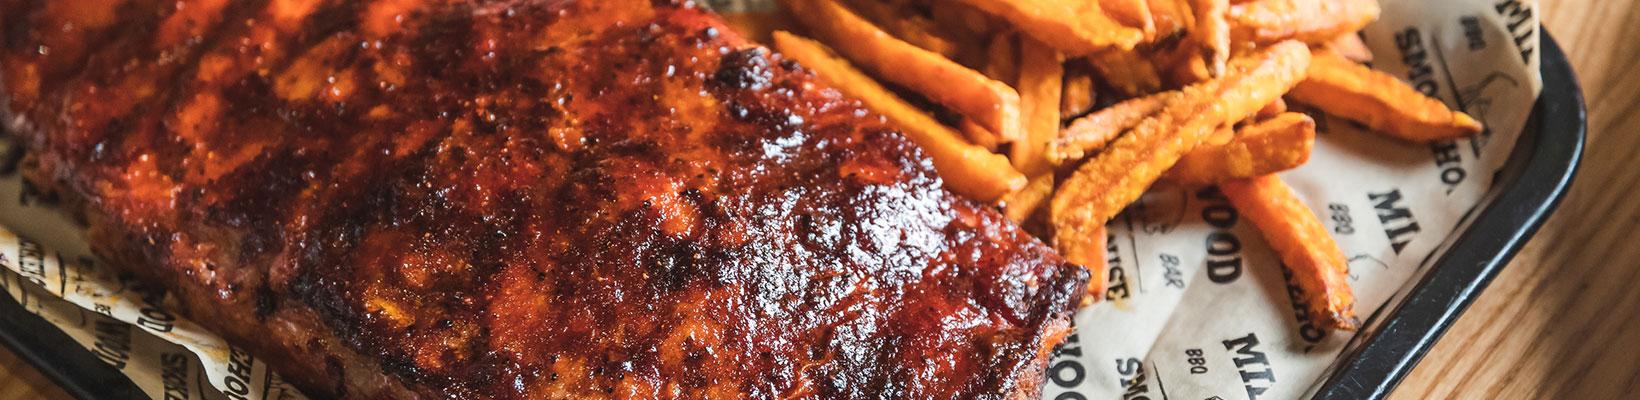 midwood-smokehouse-menu